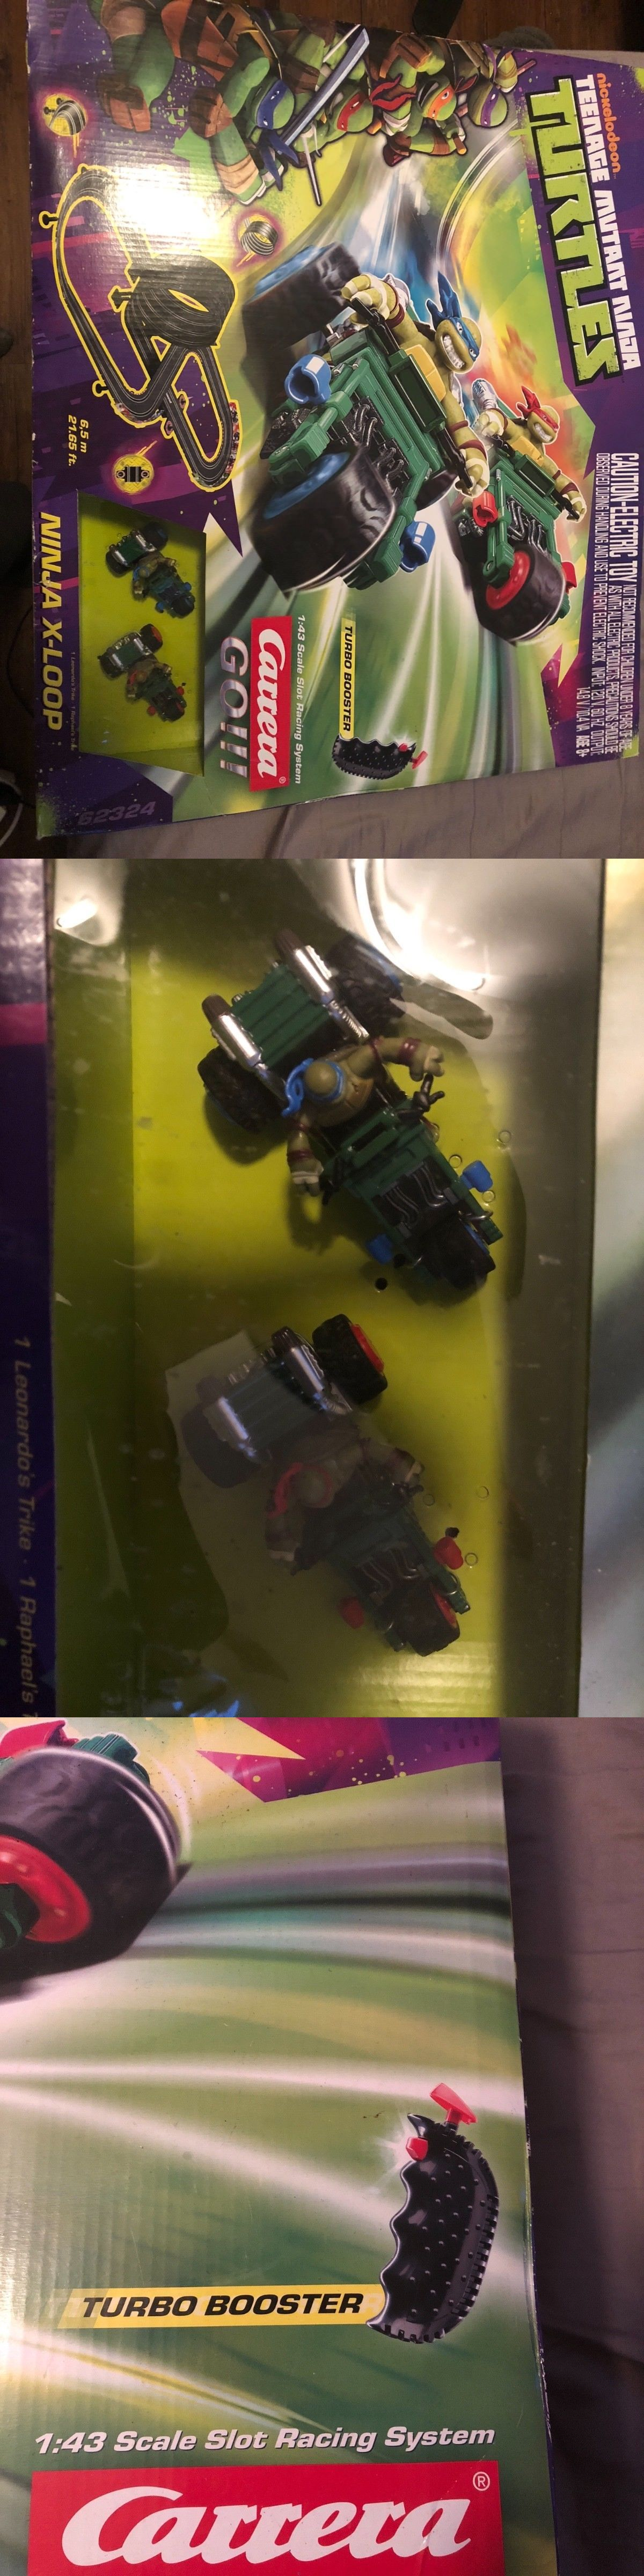 1 43 Scale 164793 Carrera Go 1 43 Scale Teenage Mutant Ninja Turtle Race Set Turtles H O Jordan Bu Teenage Mutant Ninja Turtle Mutant Teenage Mutant Ninja